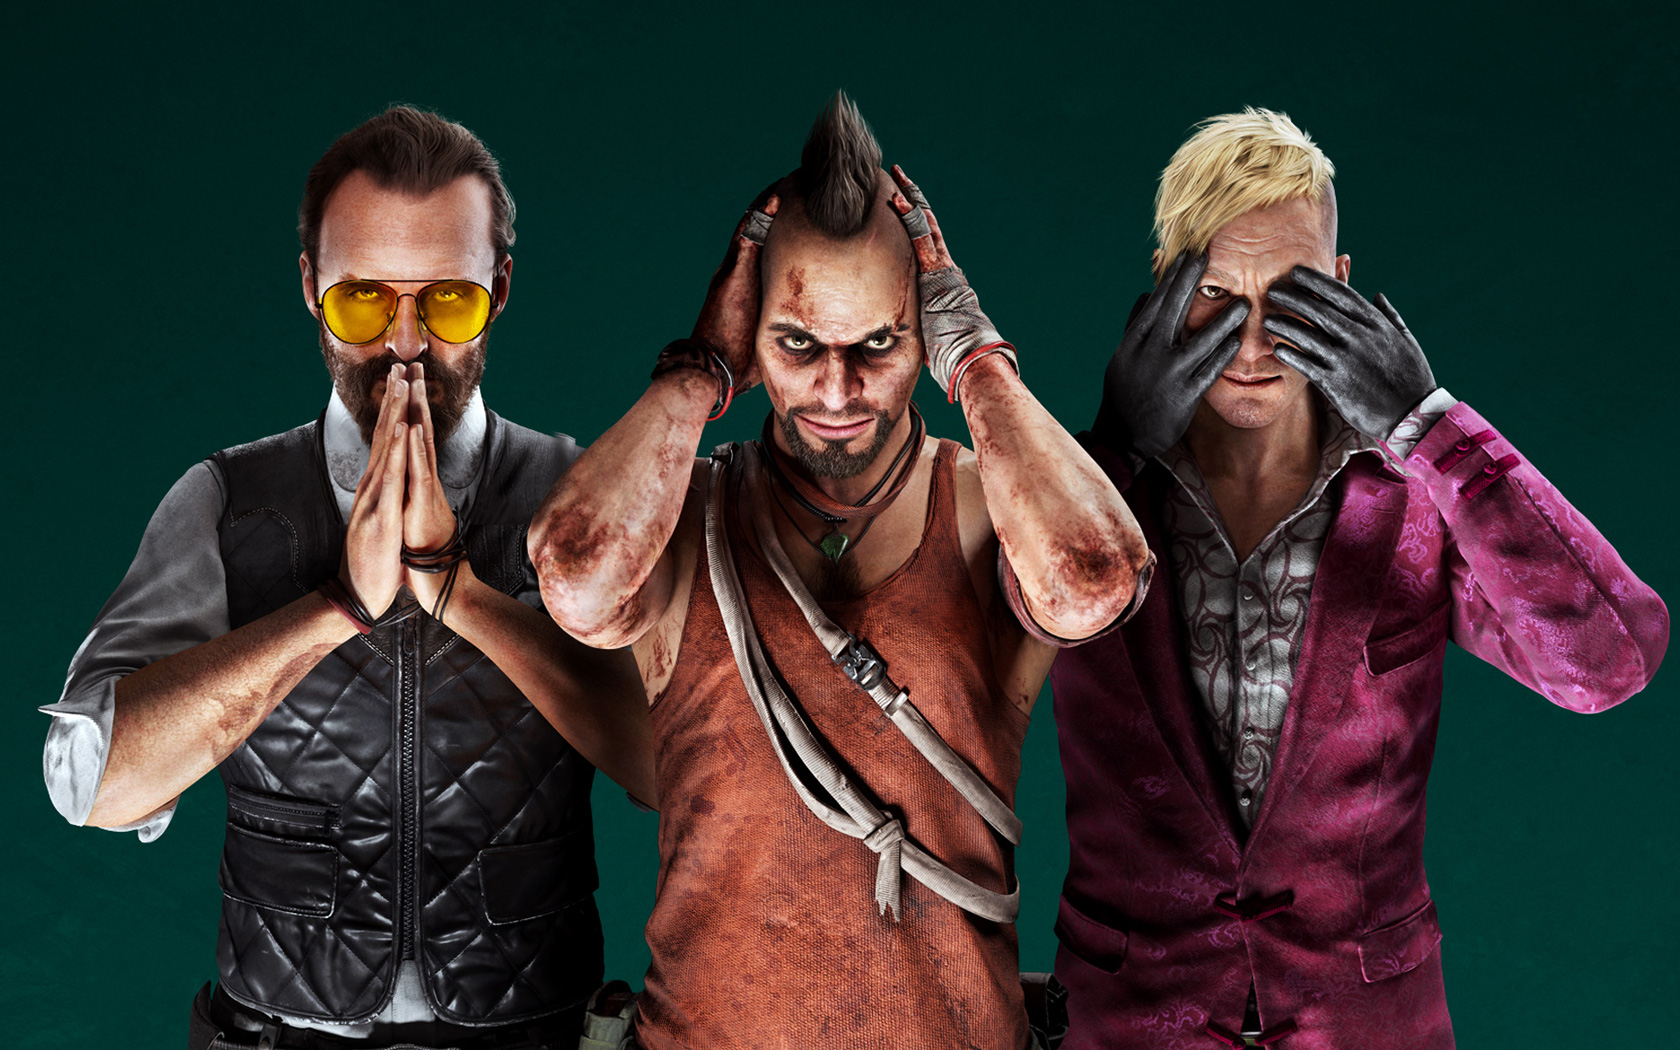 Free Far Cry 6 Wallpaper in 1680x1050